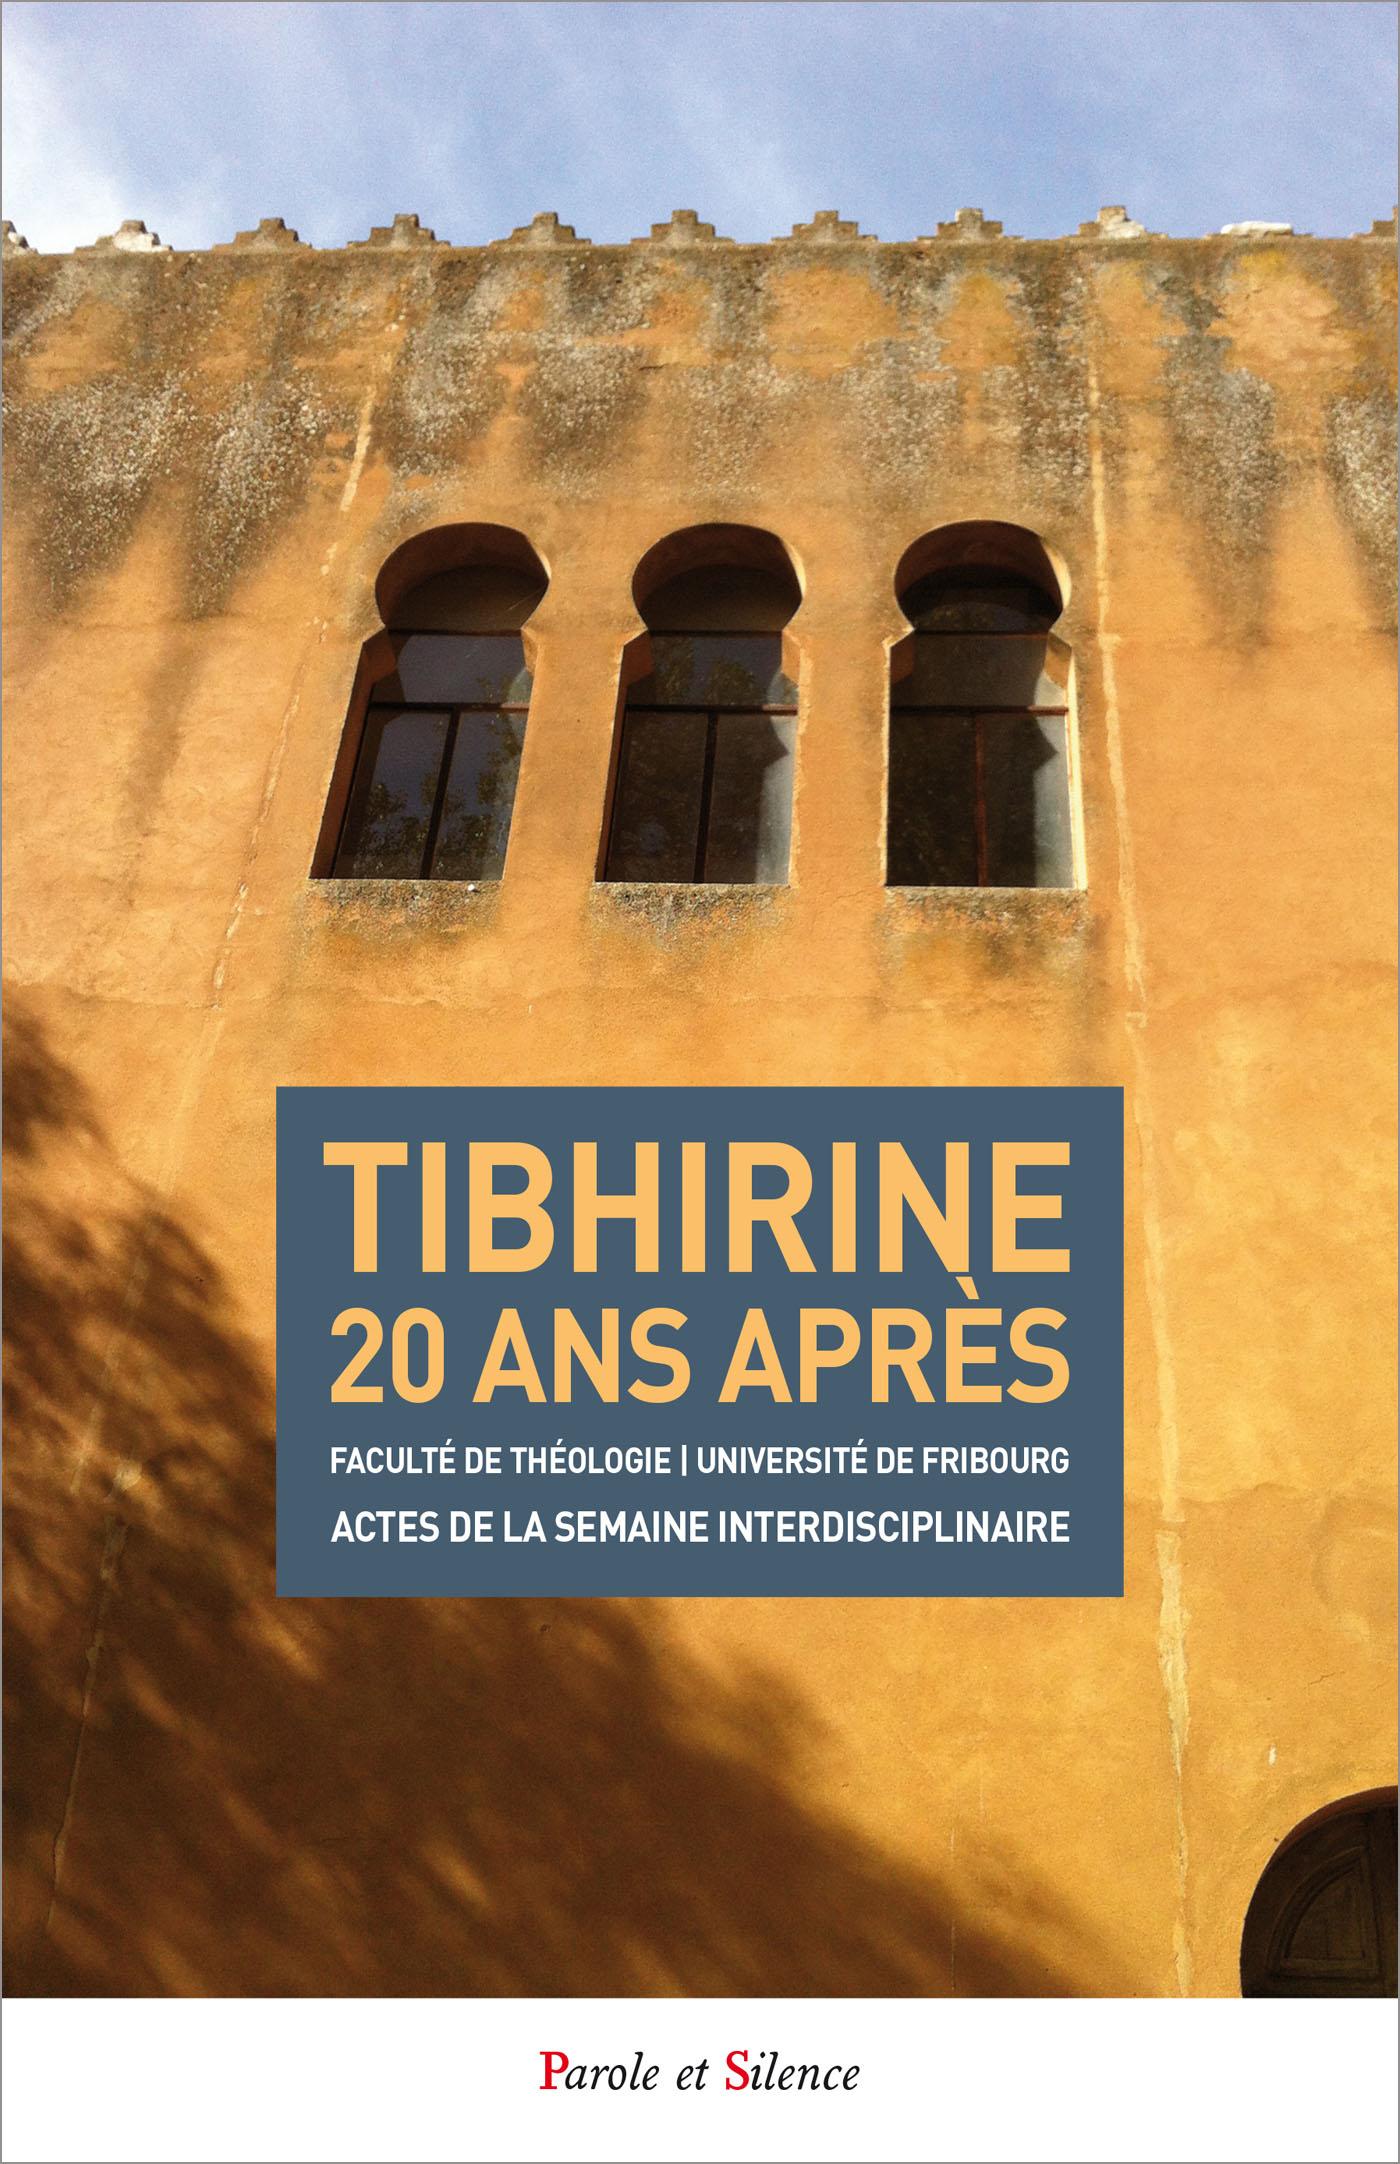 Tibhirine 20 ans après